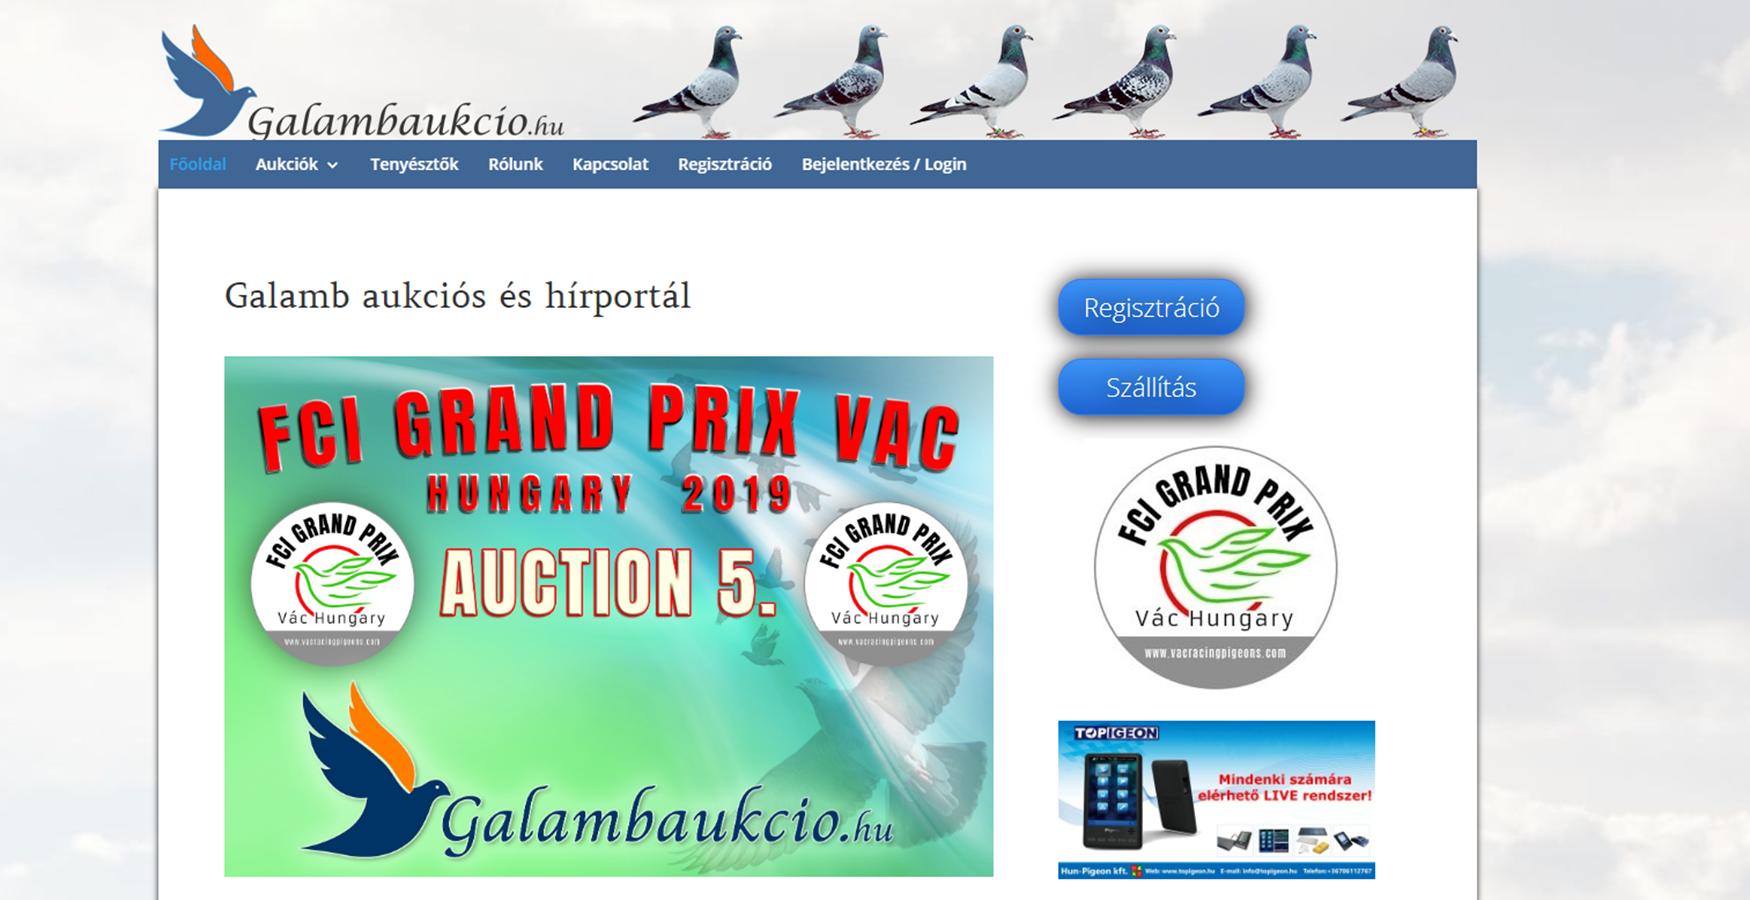 Galambaukcio